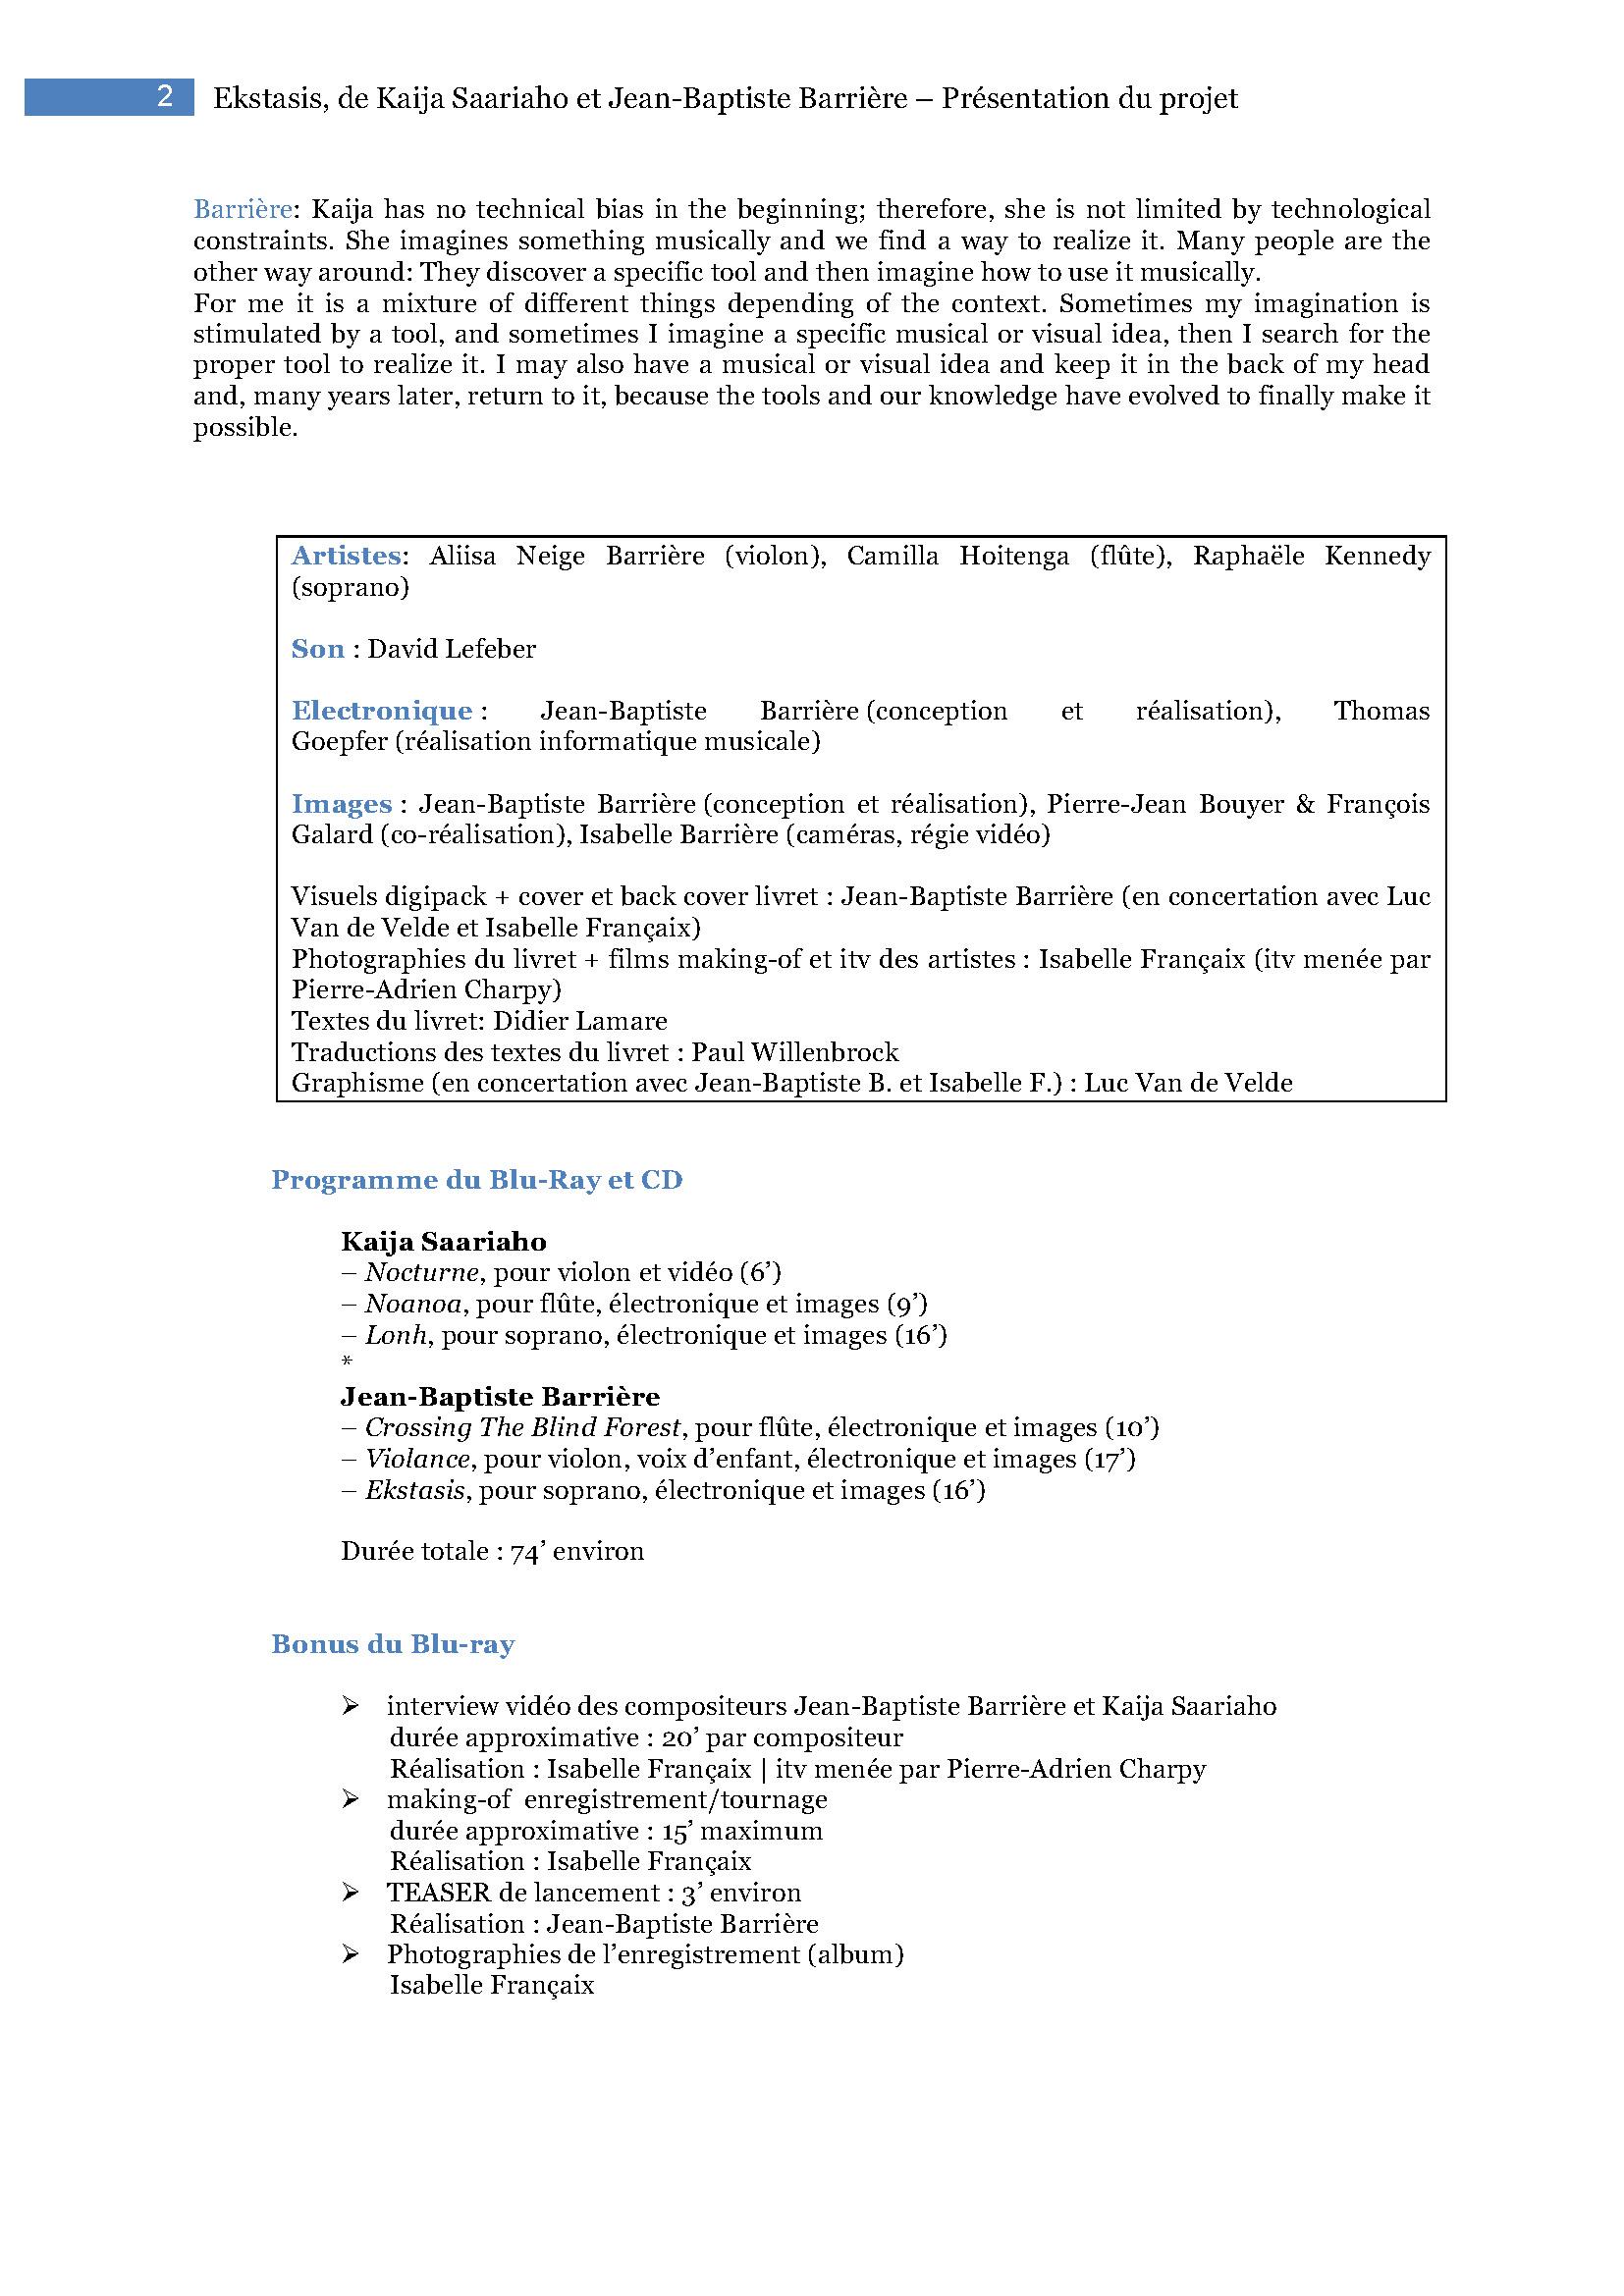 Ekstasis_Page_2